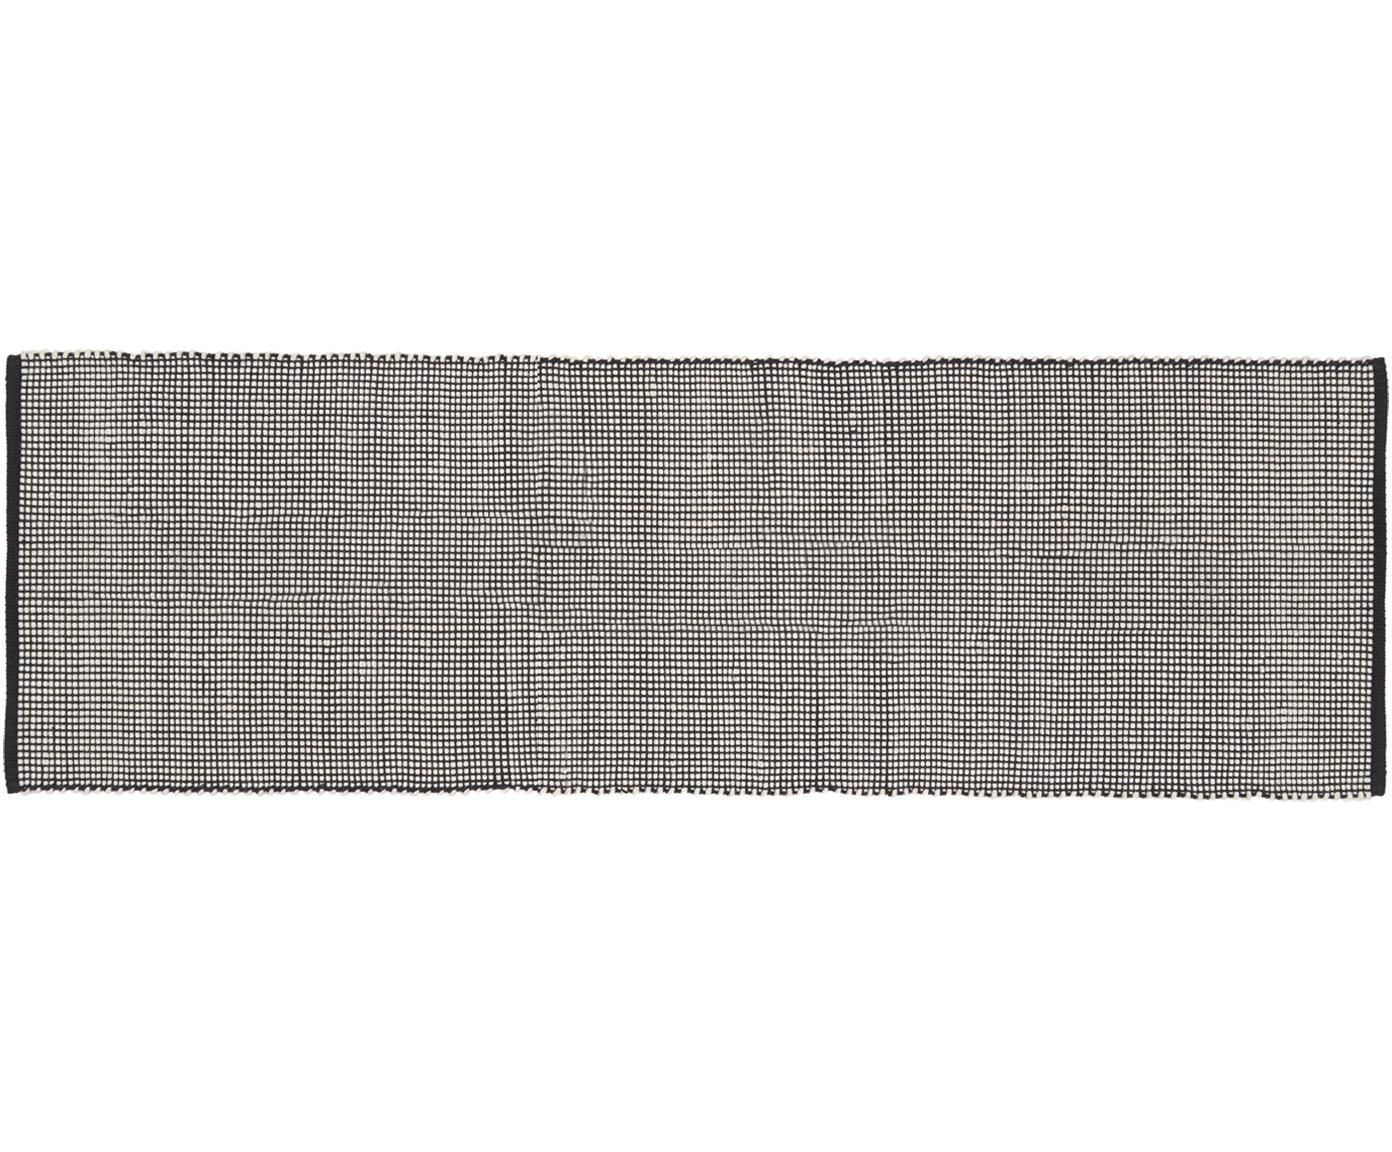 Alfombra artesanal de lana Amaro, 38%lana, 22%poliéster, 20%algodón, 20%poliamida, Negro, blanco crema, An 80 x L 250 cm